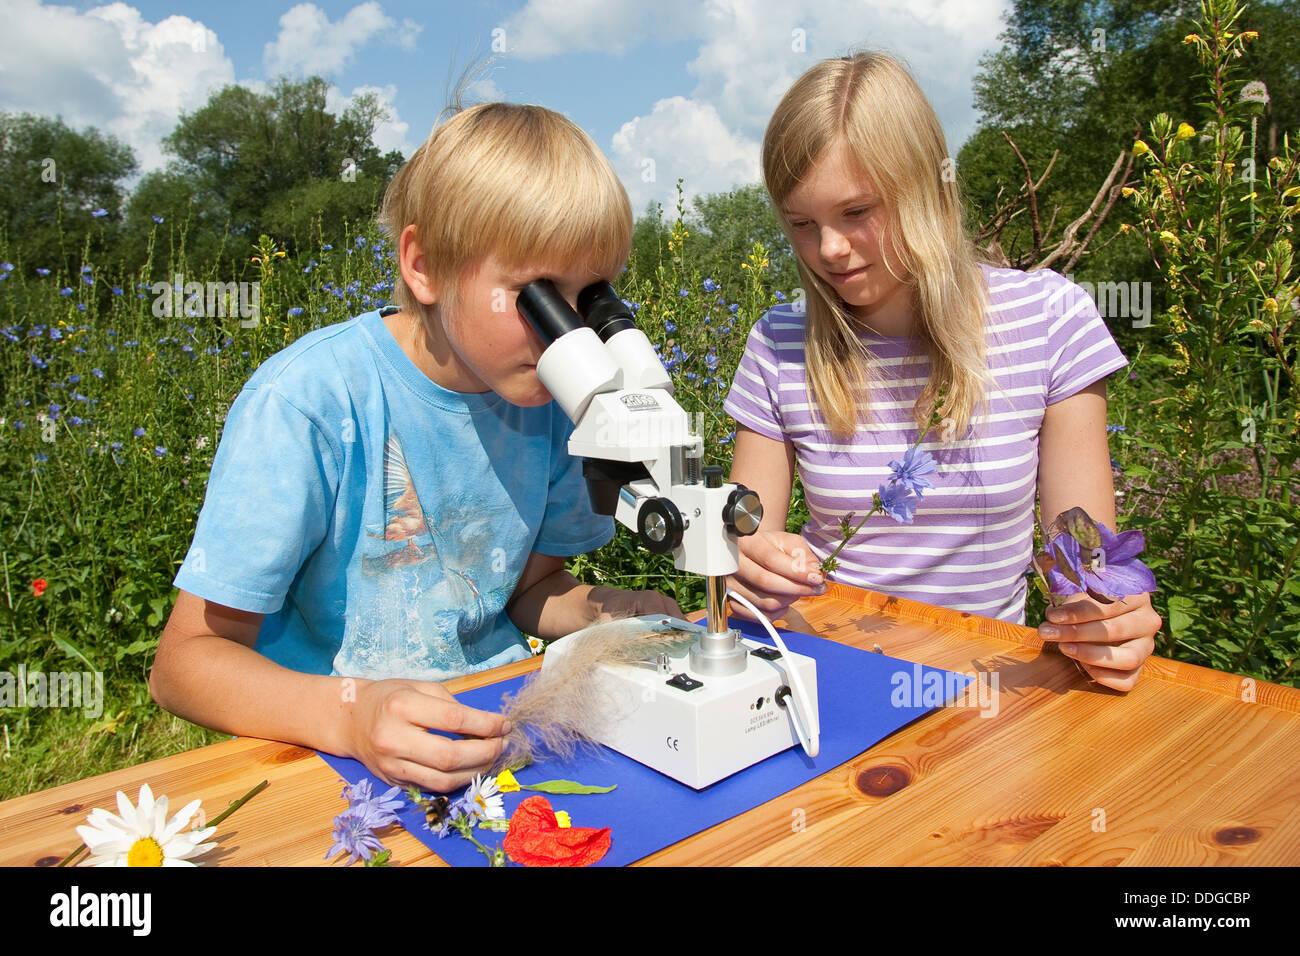 Child, children, binocular loupe, magnifier, Kind, Mädchen, Kinder, Binokular, Stereolupe, Naturerlebnis, Nature experience Stock Photo